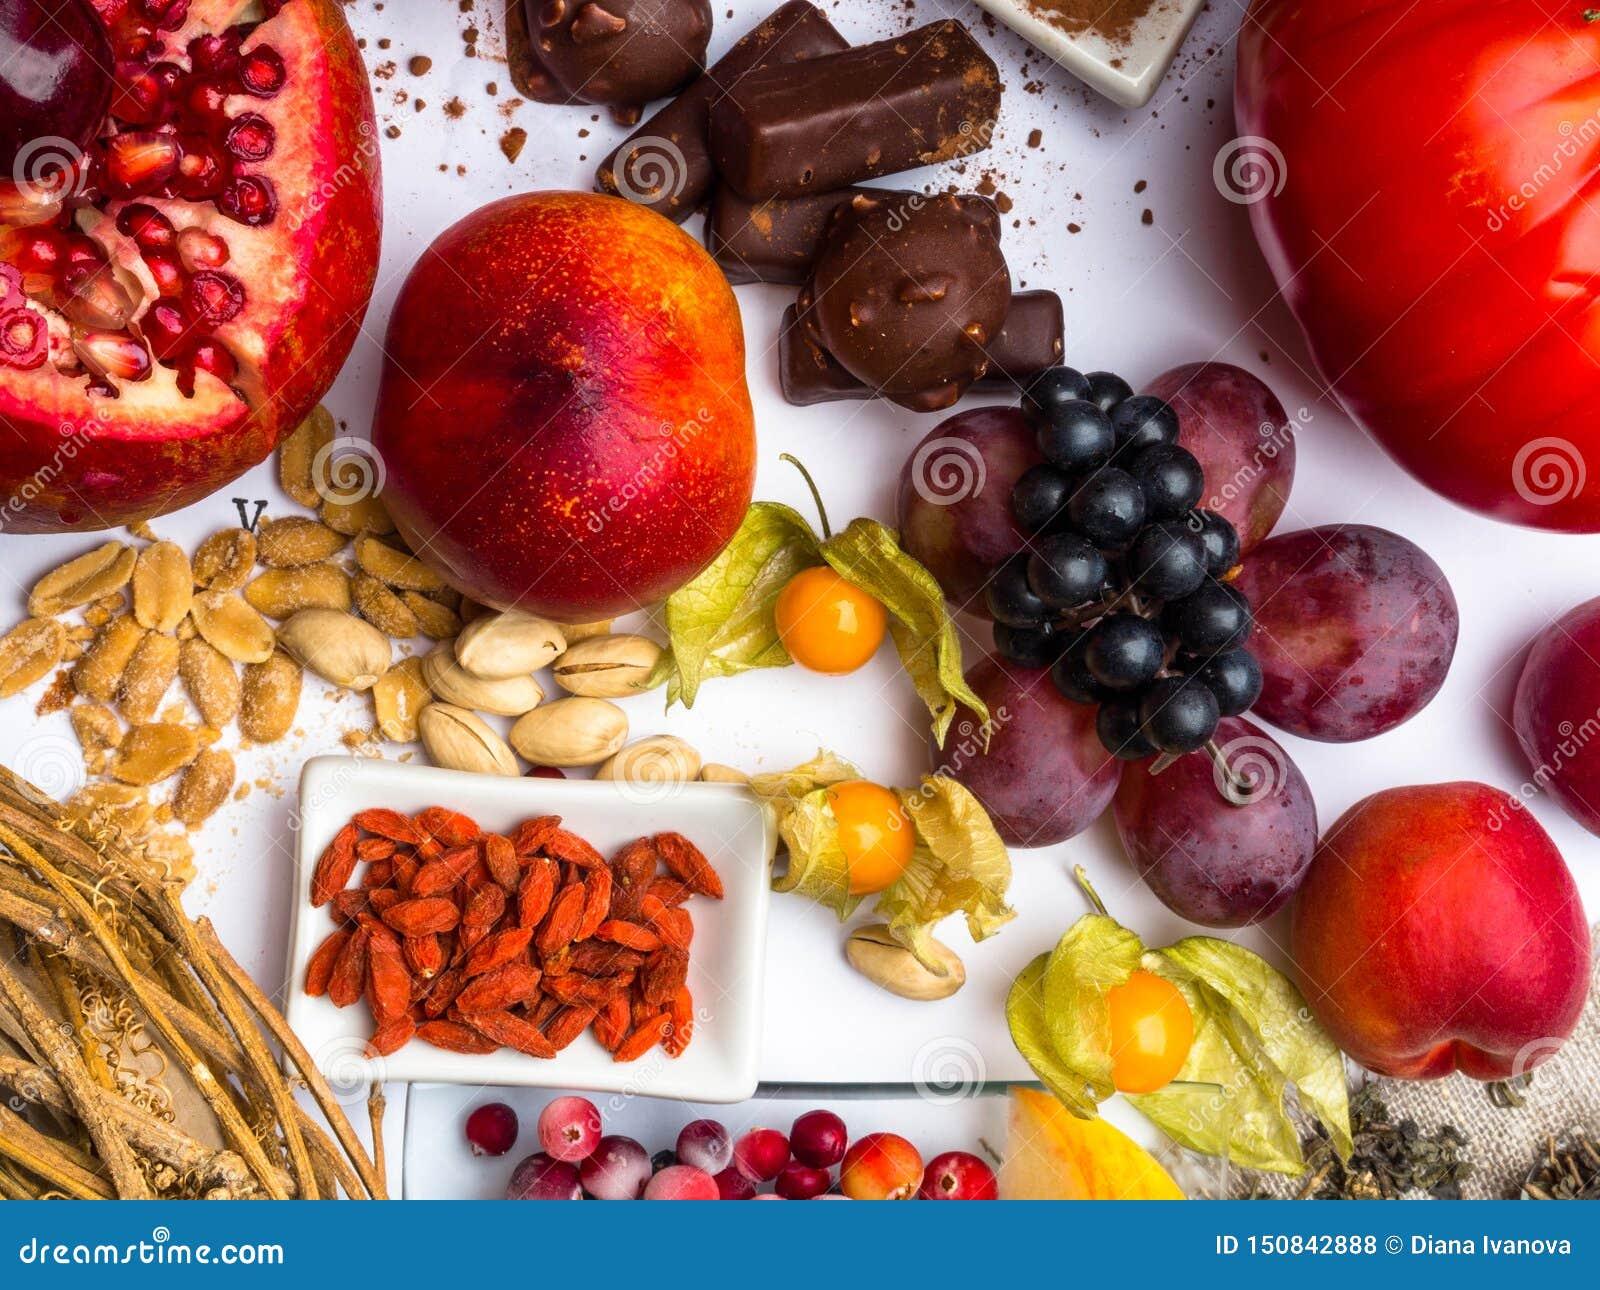 Antioxidantes, comida del resveratrol como té verde, uva, arándano, albaricoque, manzana, cacao, tomates, granada, physalis, oscu